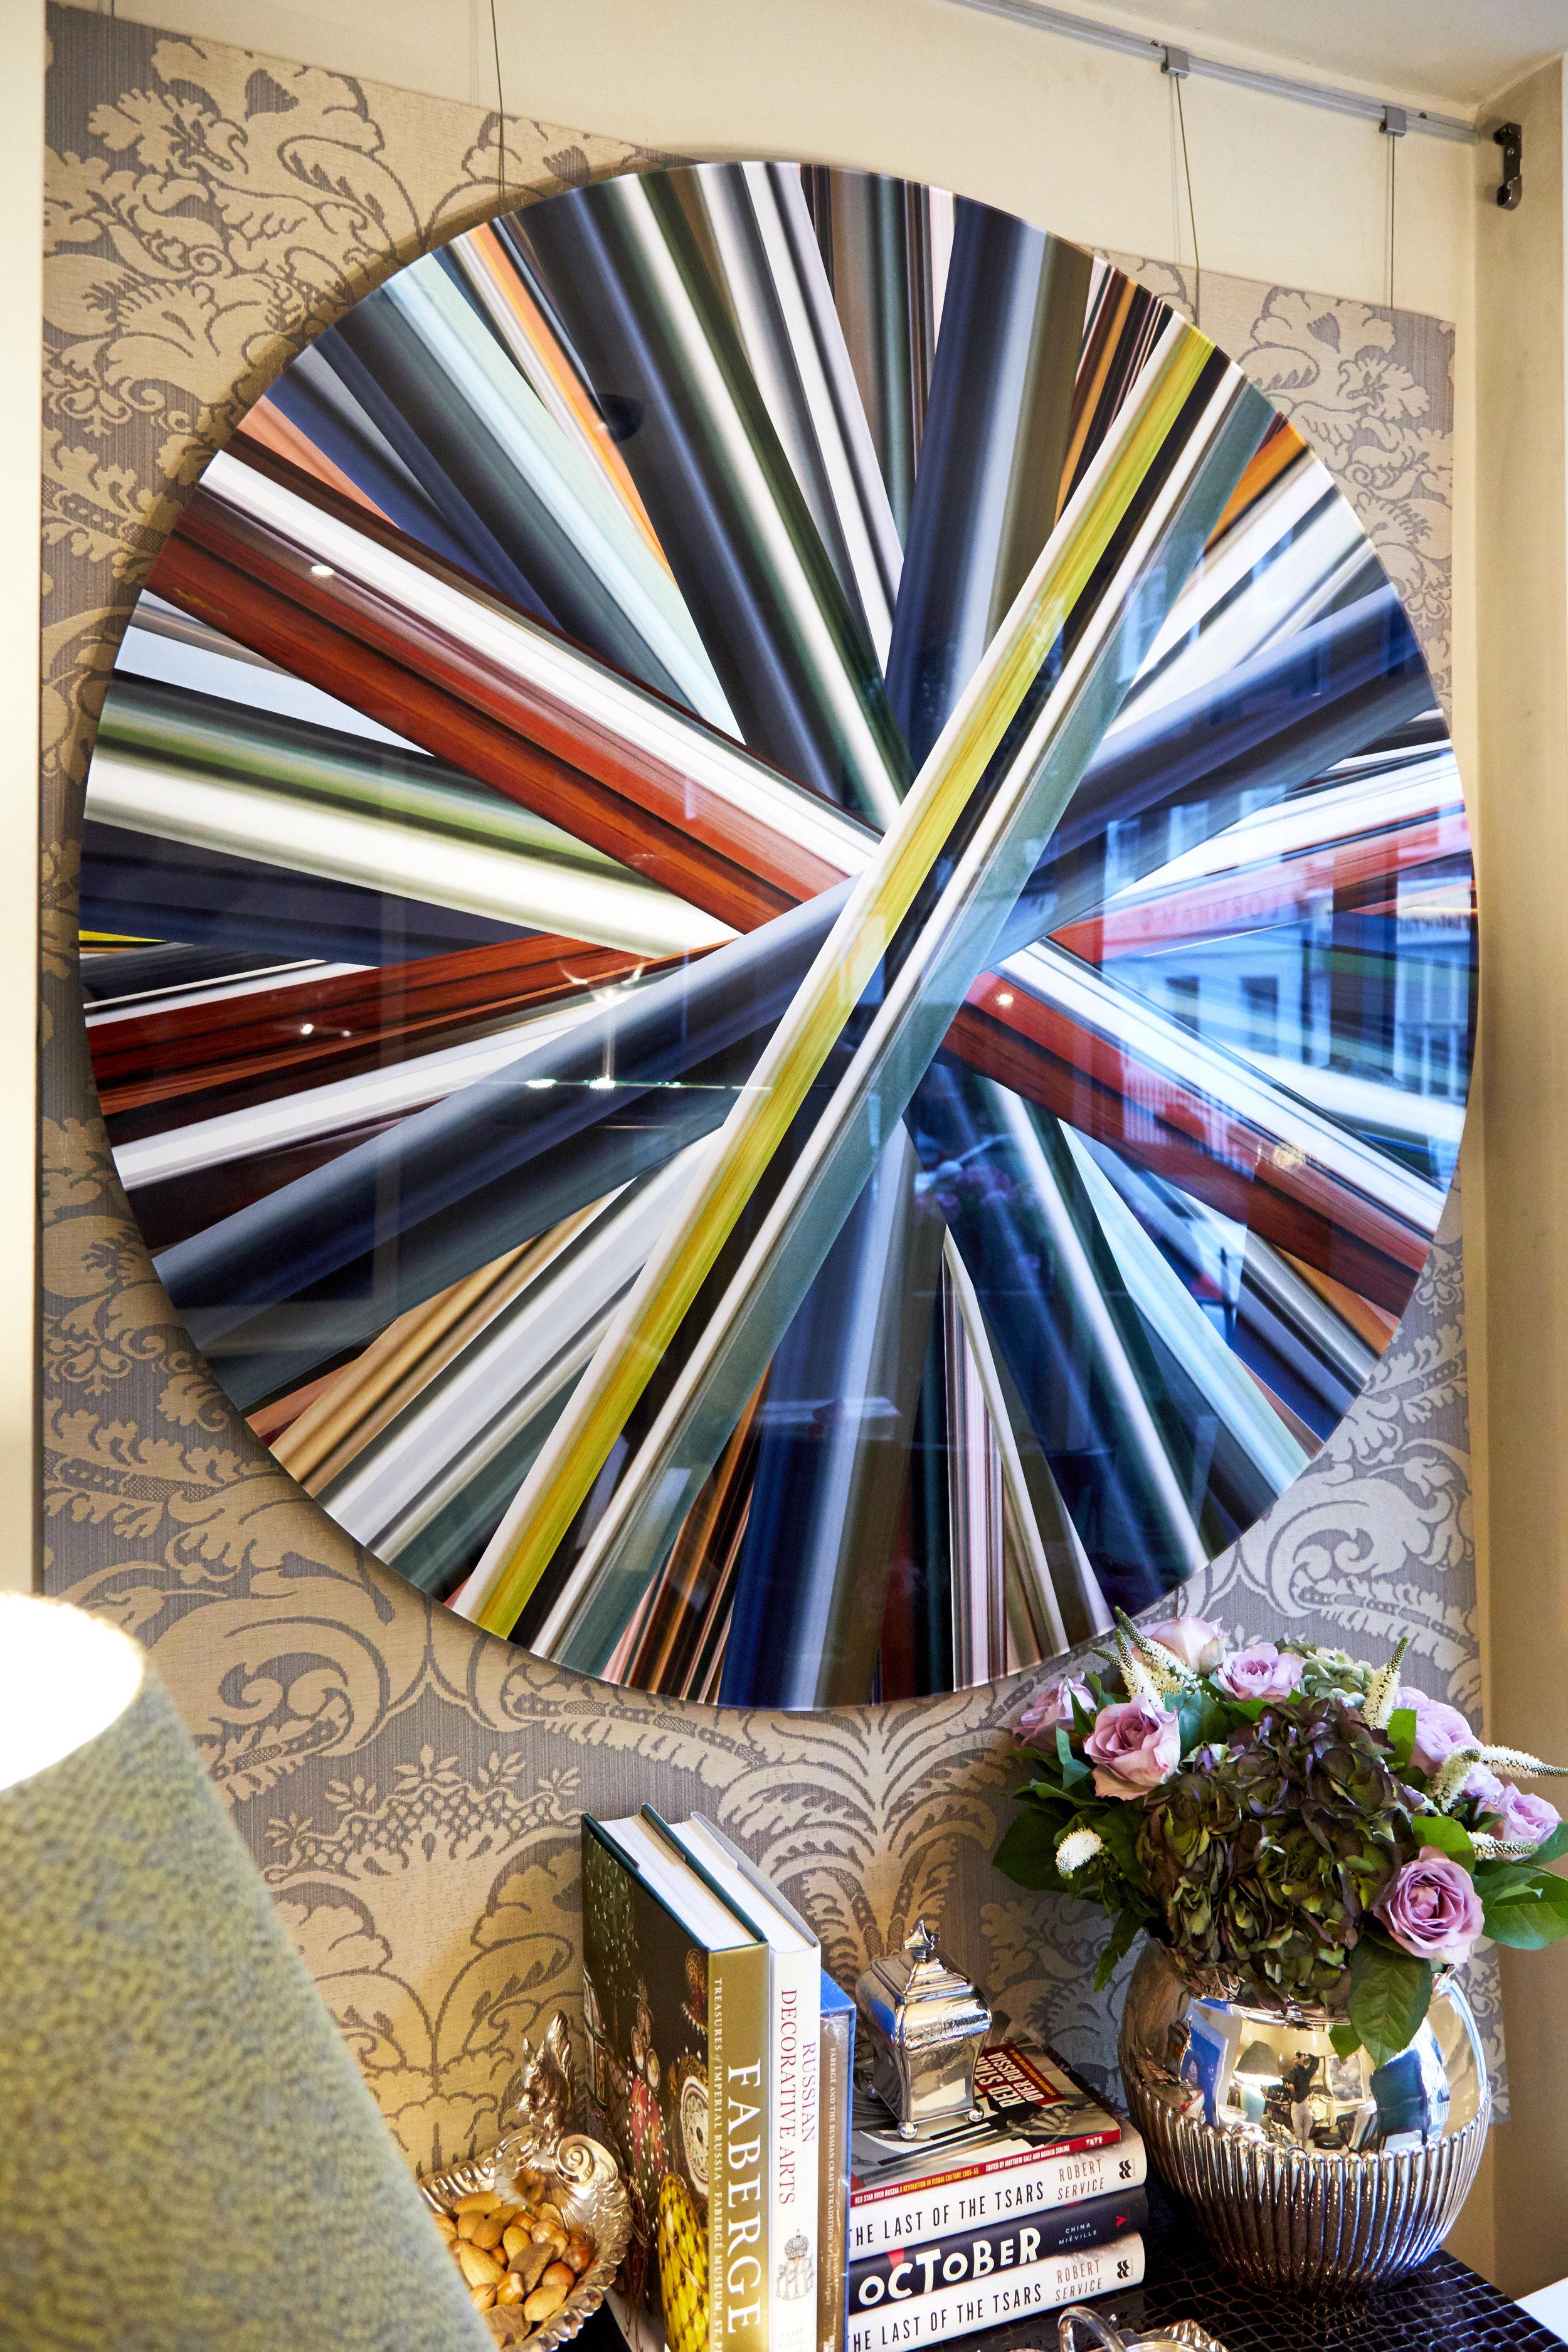 Eduardo Santos,Wheel of Light 001 - Chromogenic printFramed in acrylic and aluminium with a polished edgeLimited Edition 5/5120cm x 120cm